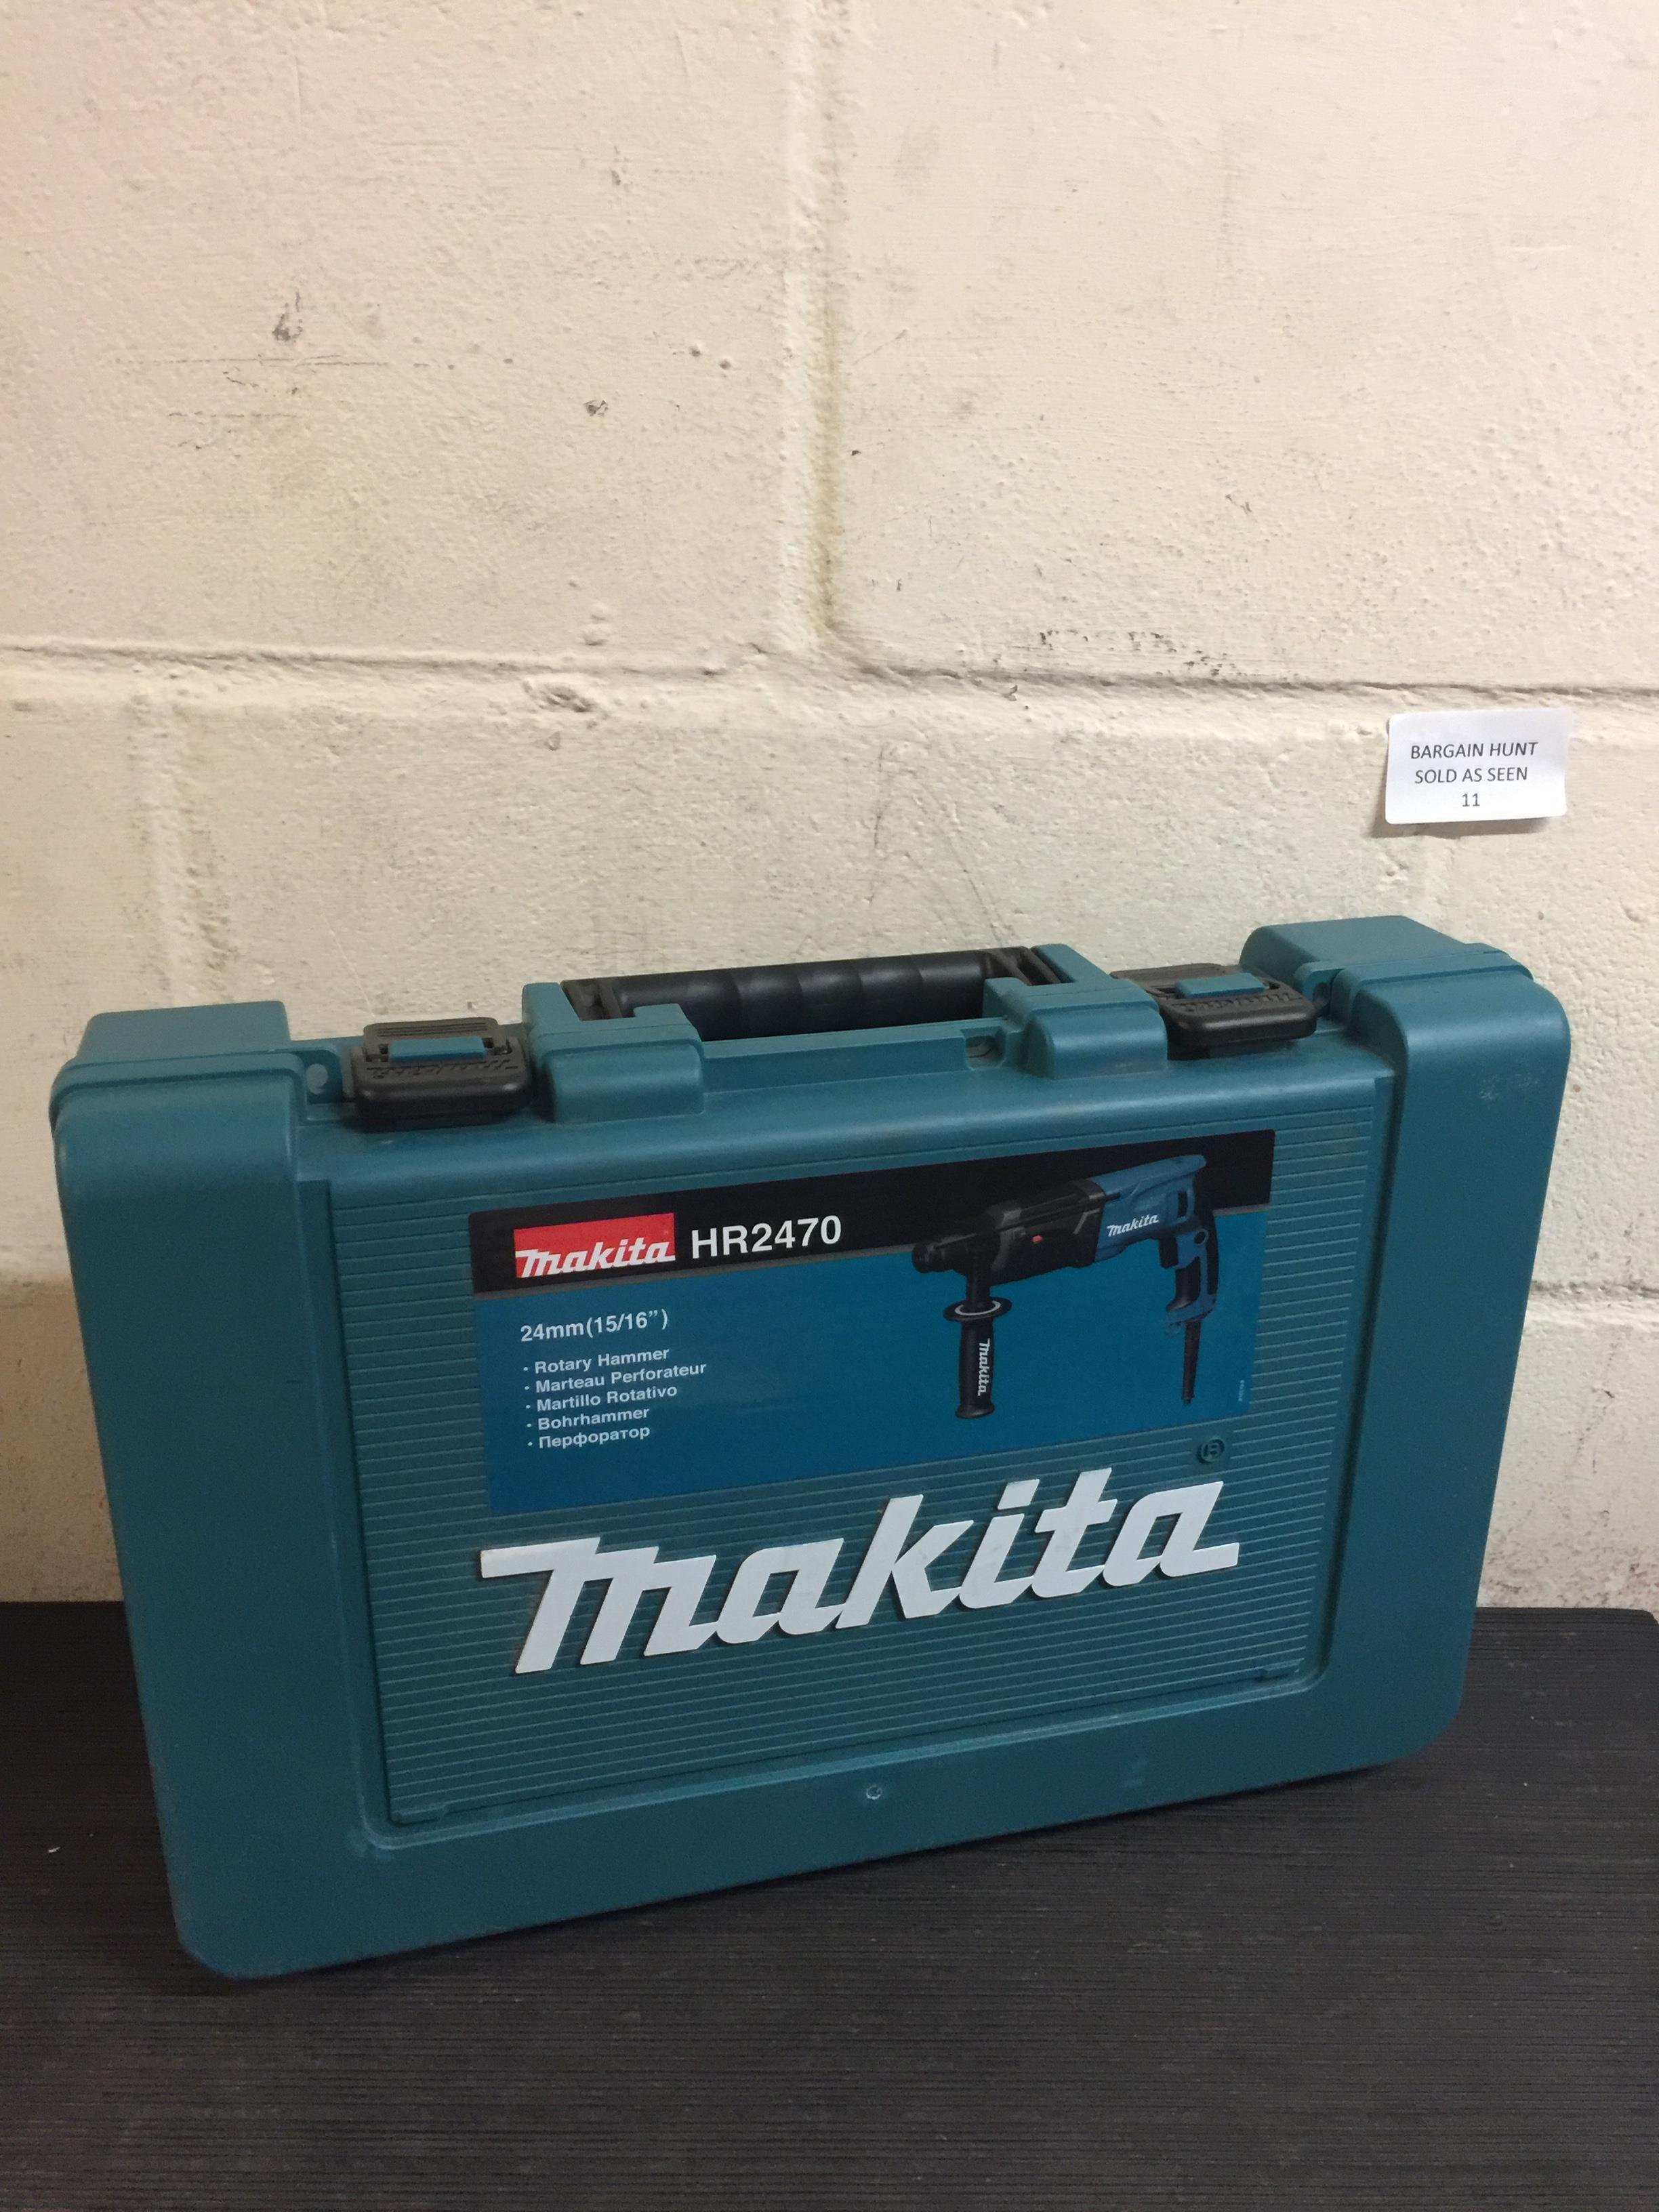 Lot 11 - Makita HR2470X Rotary Hammer Drill (no power) RRP £119.99